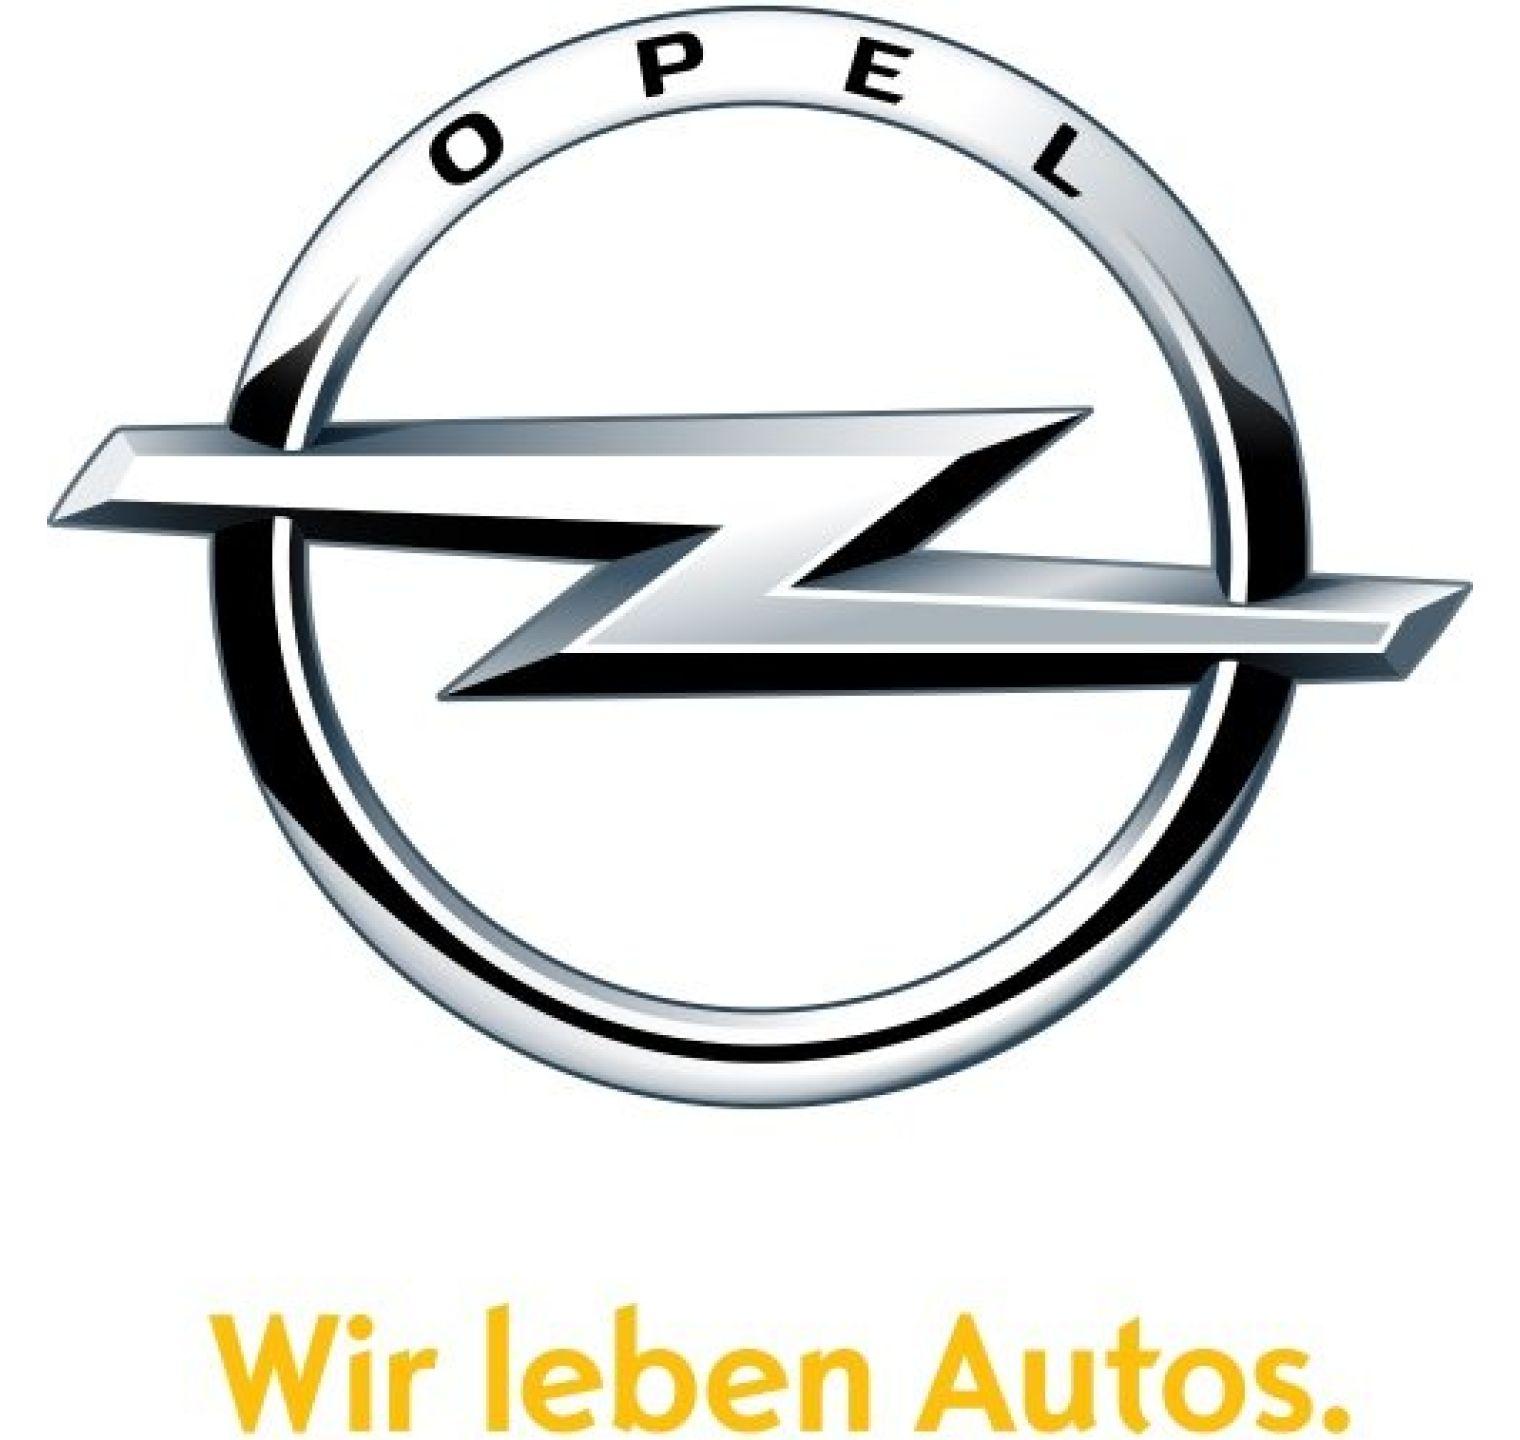 Opel Astra J Gtc (2011 t/m 2013) - set ruitenwissers Valeo Silencio flatblade